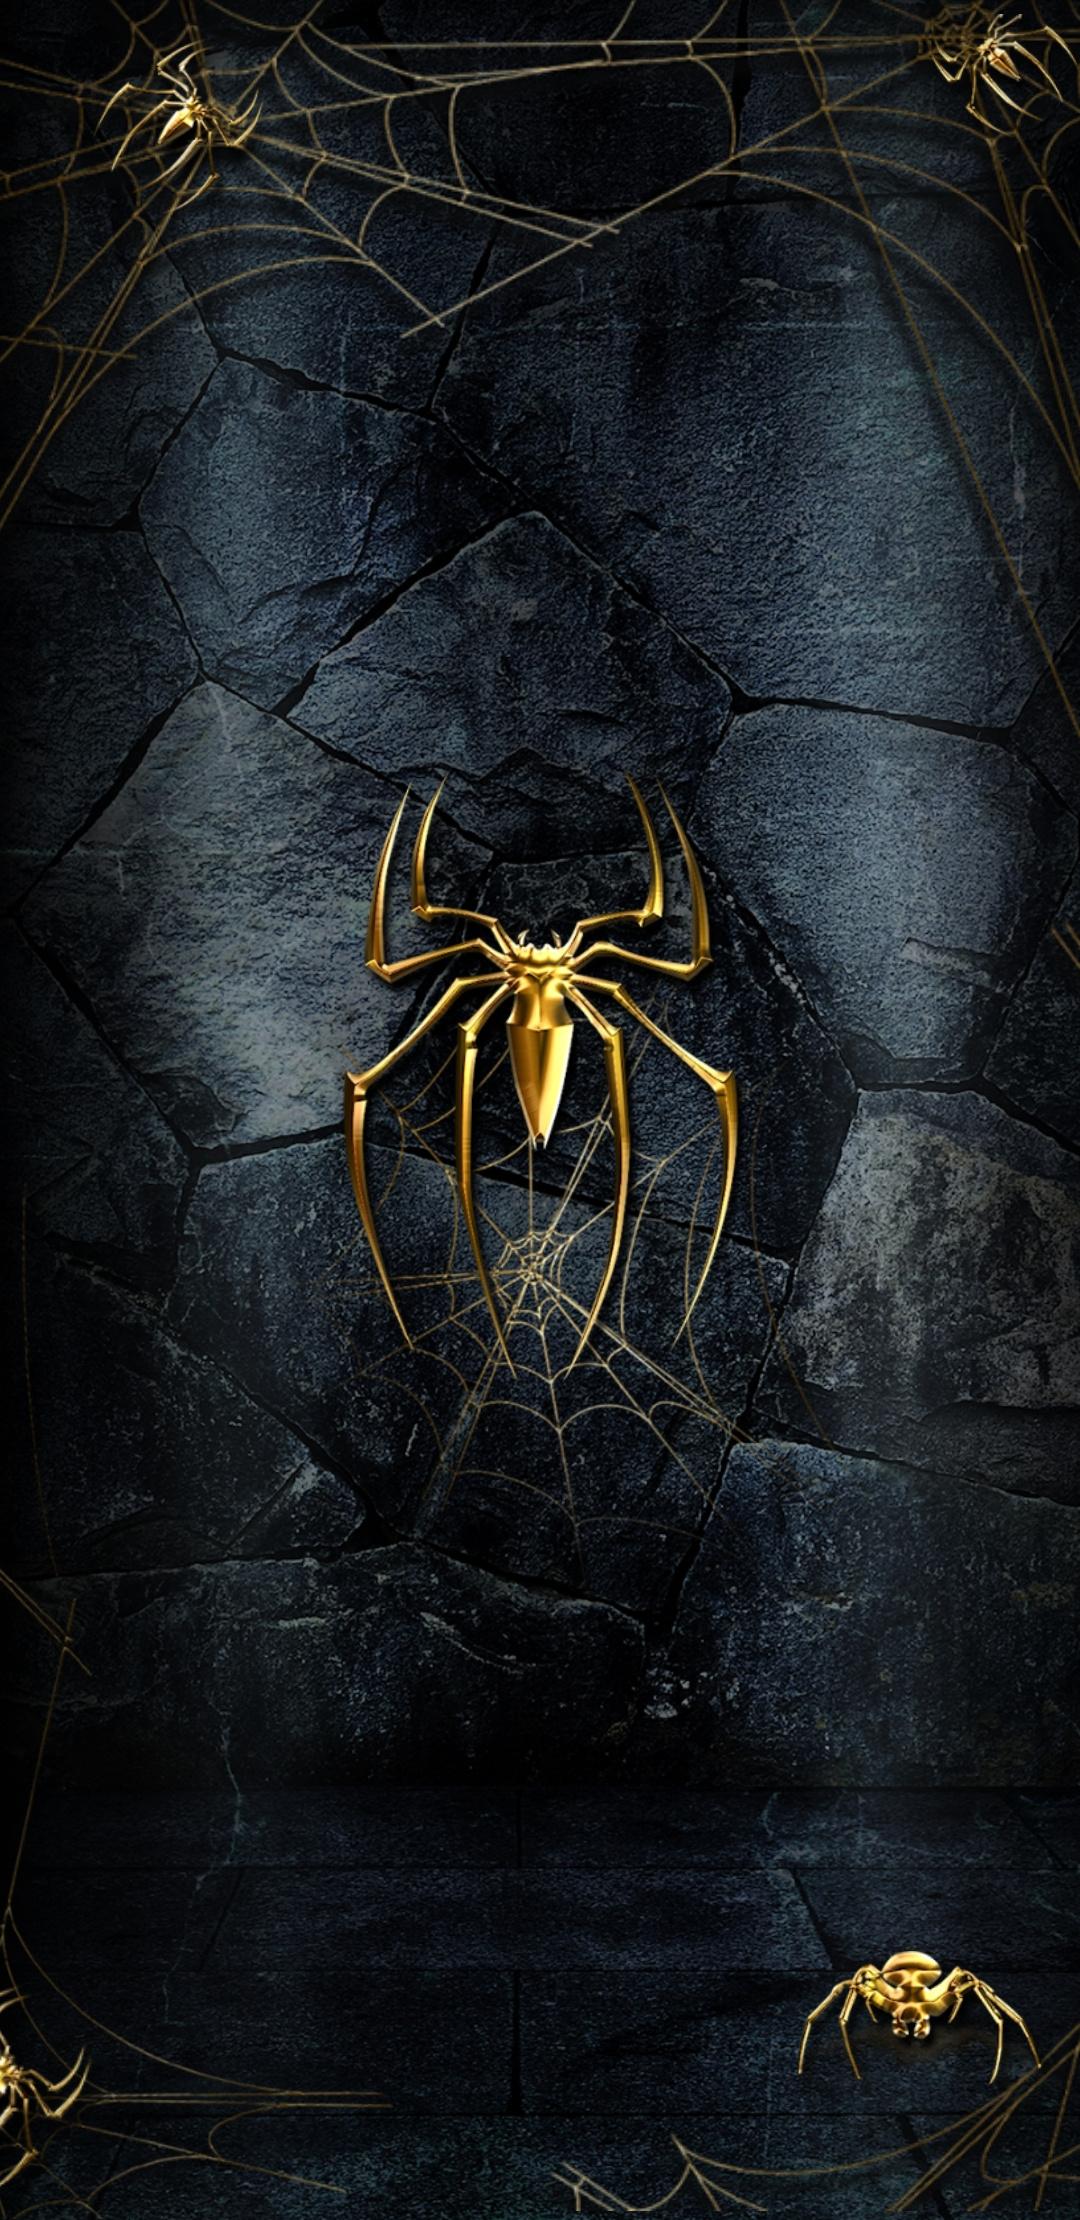 Spider  Mobile Phone Wallpaper